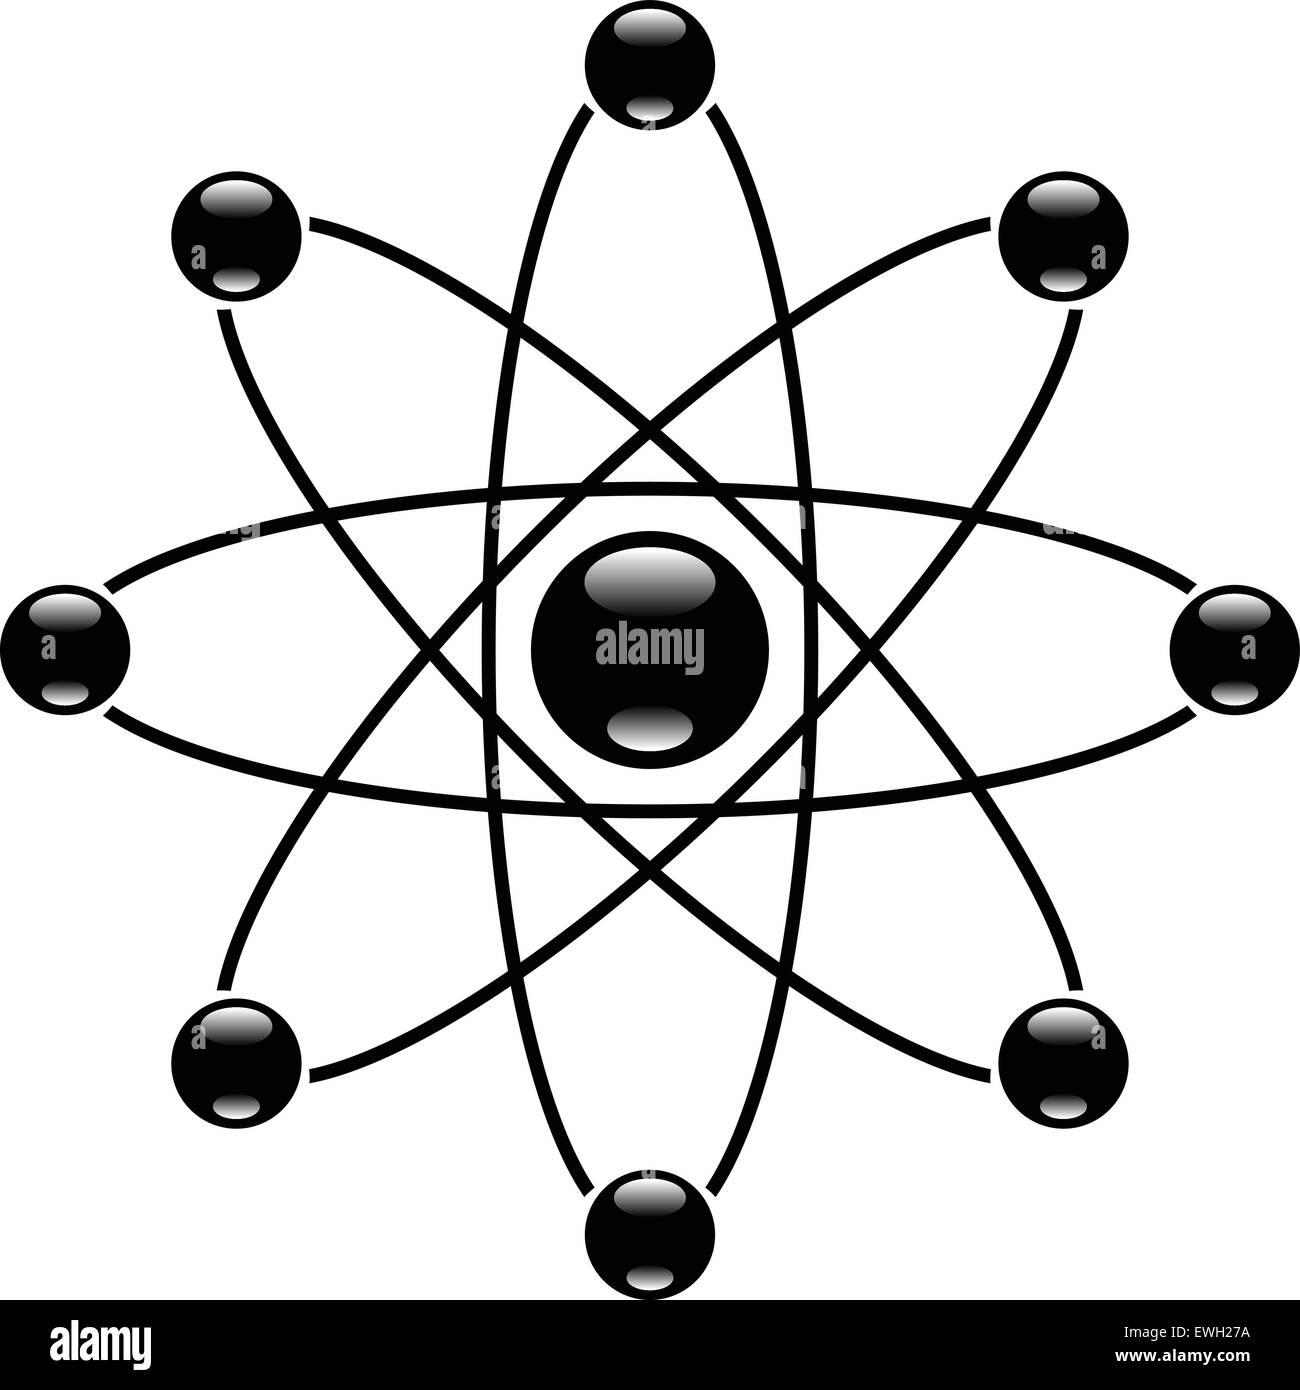 orbital diagram for beryllium make your own venn electron stock photos and